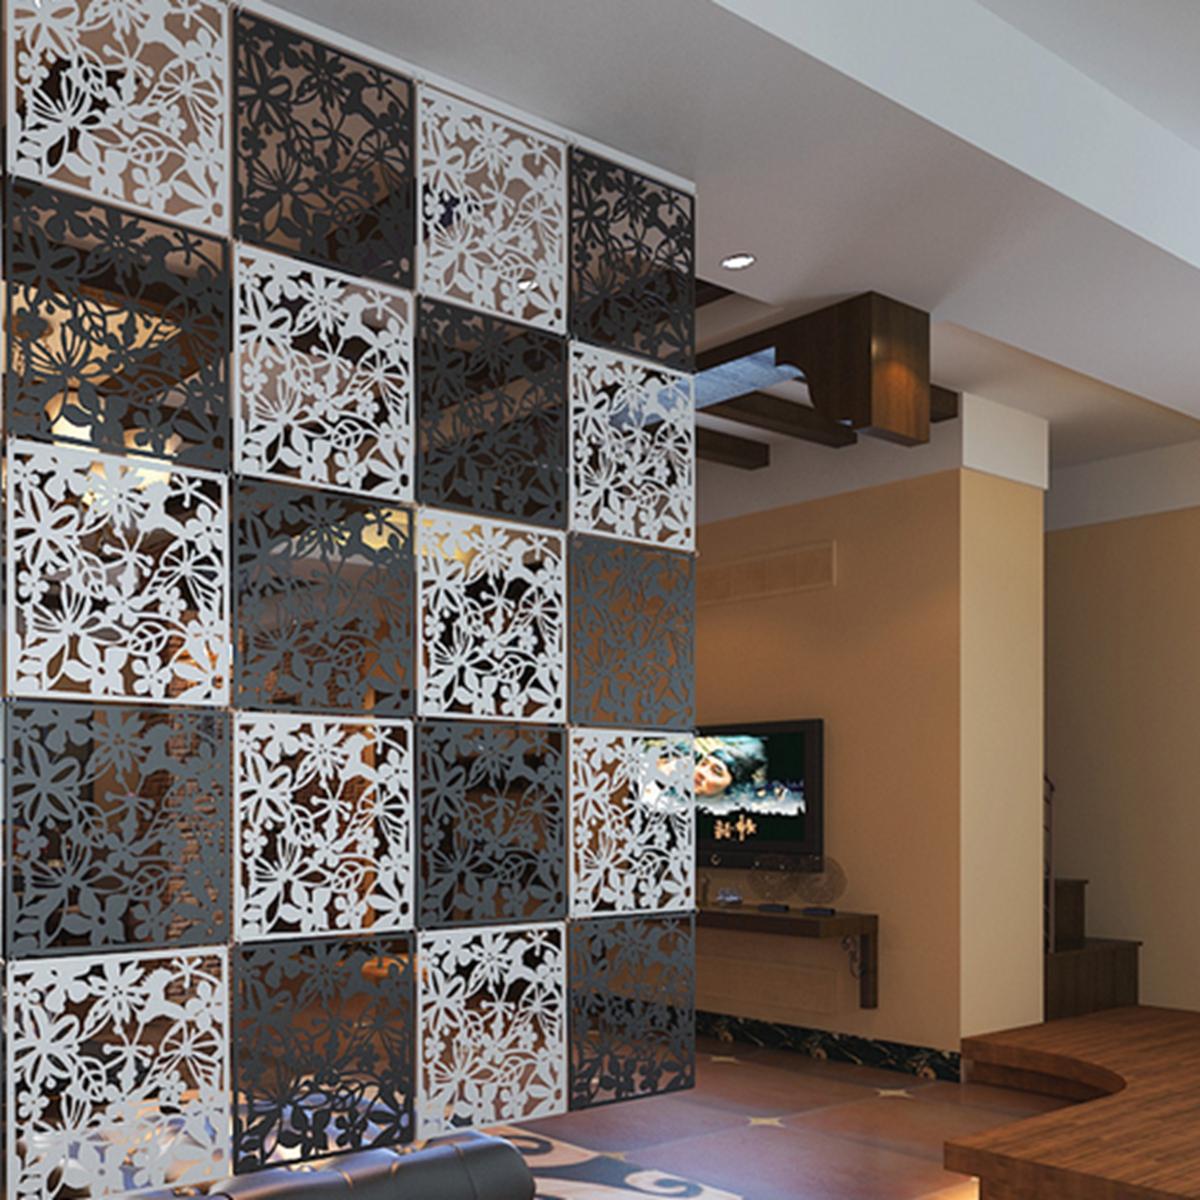 wall decor dividers photo - 6